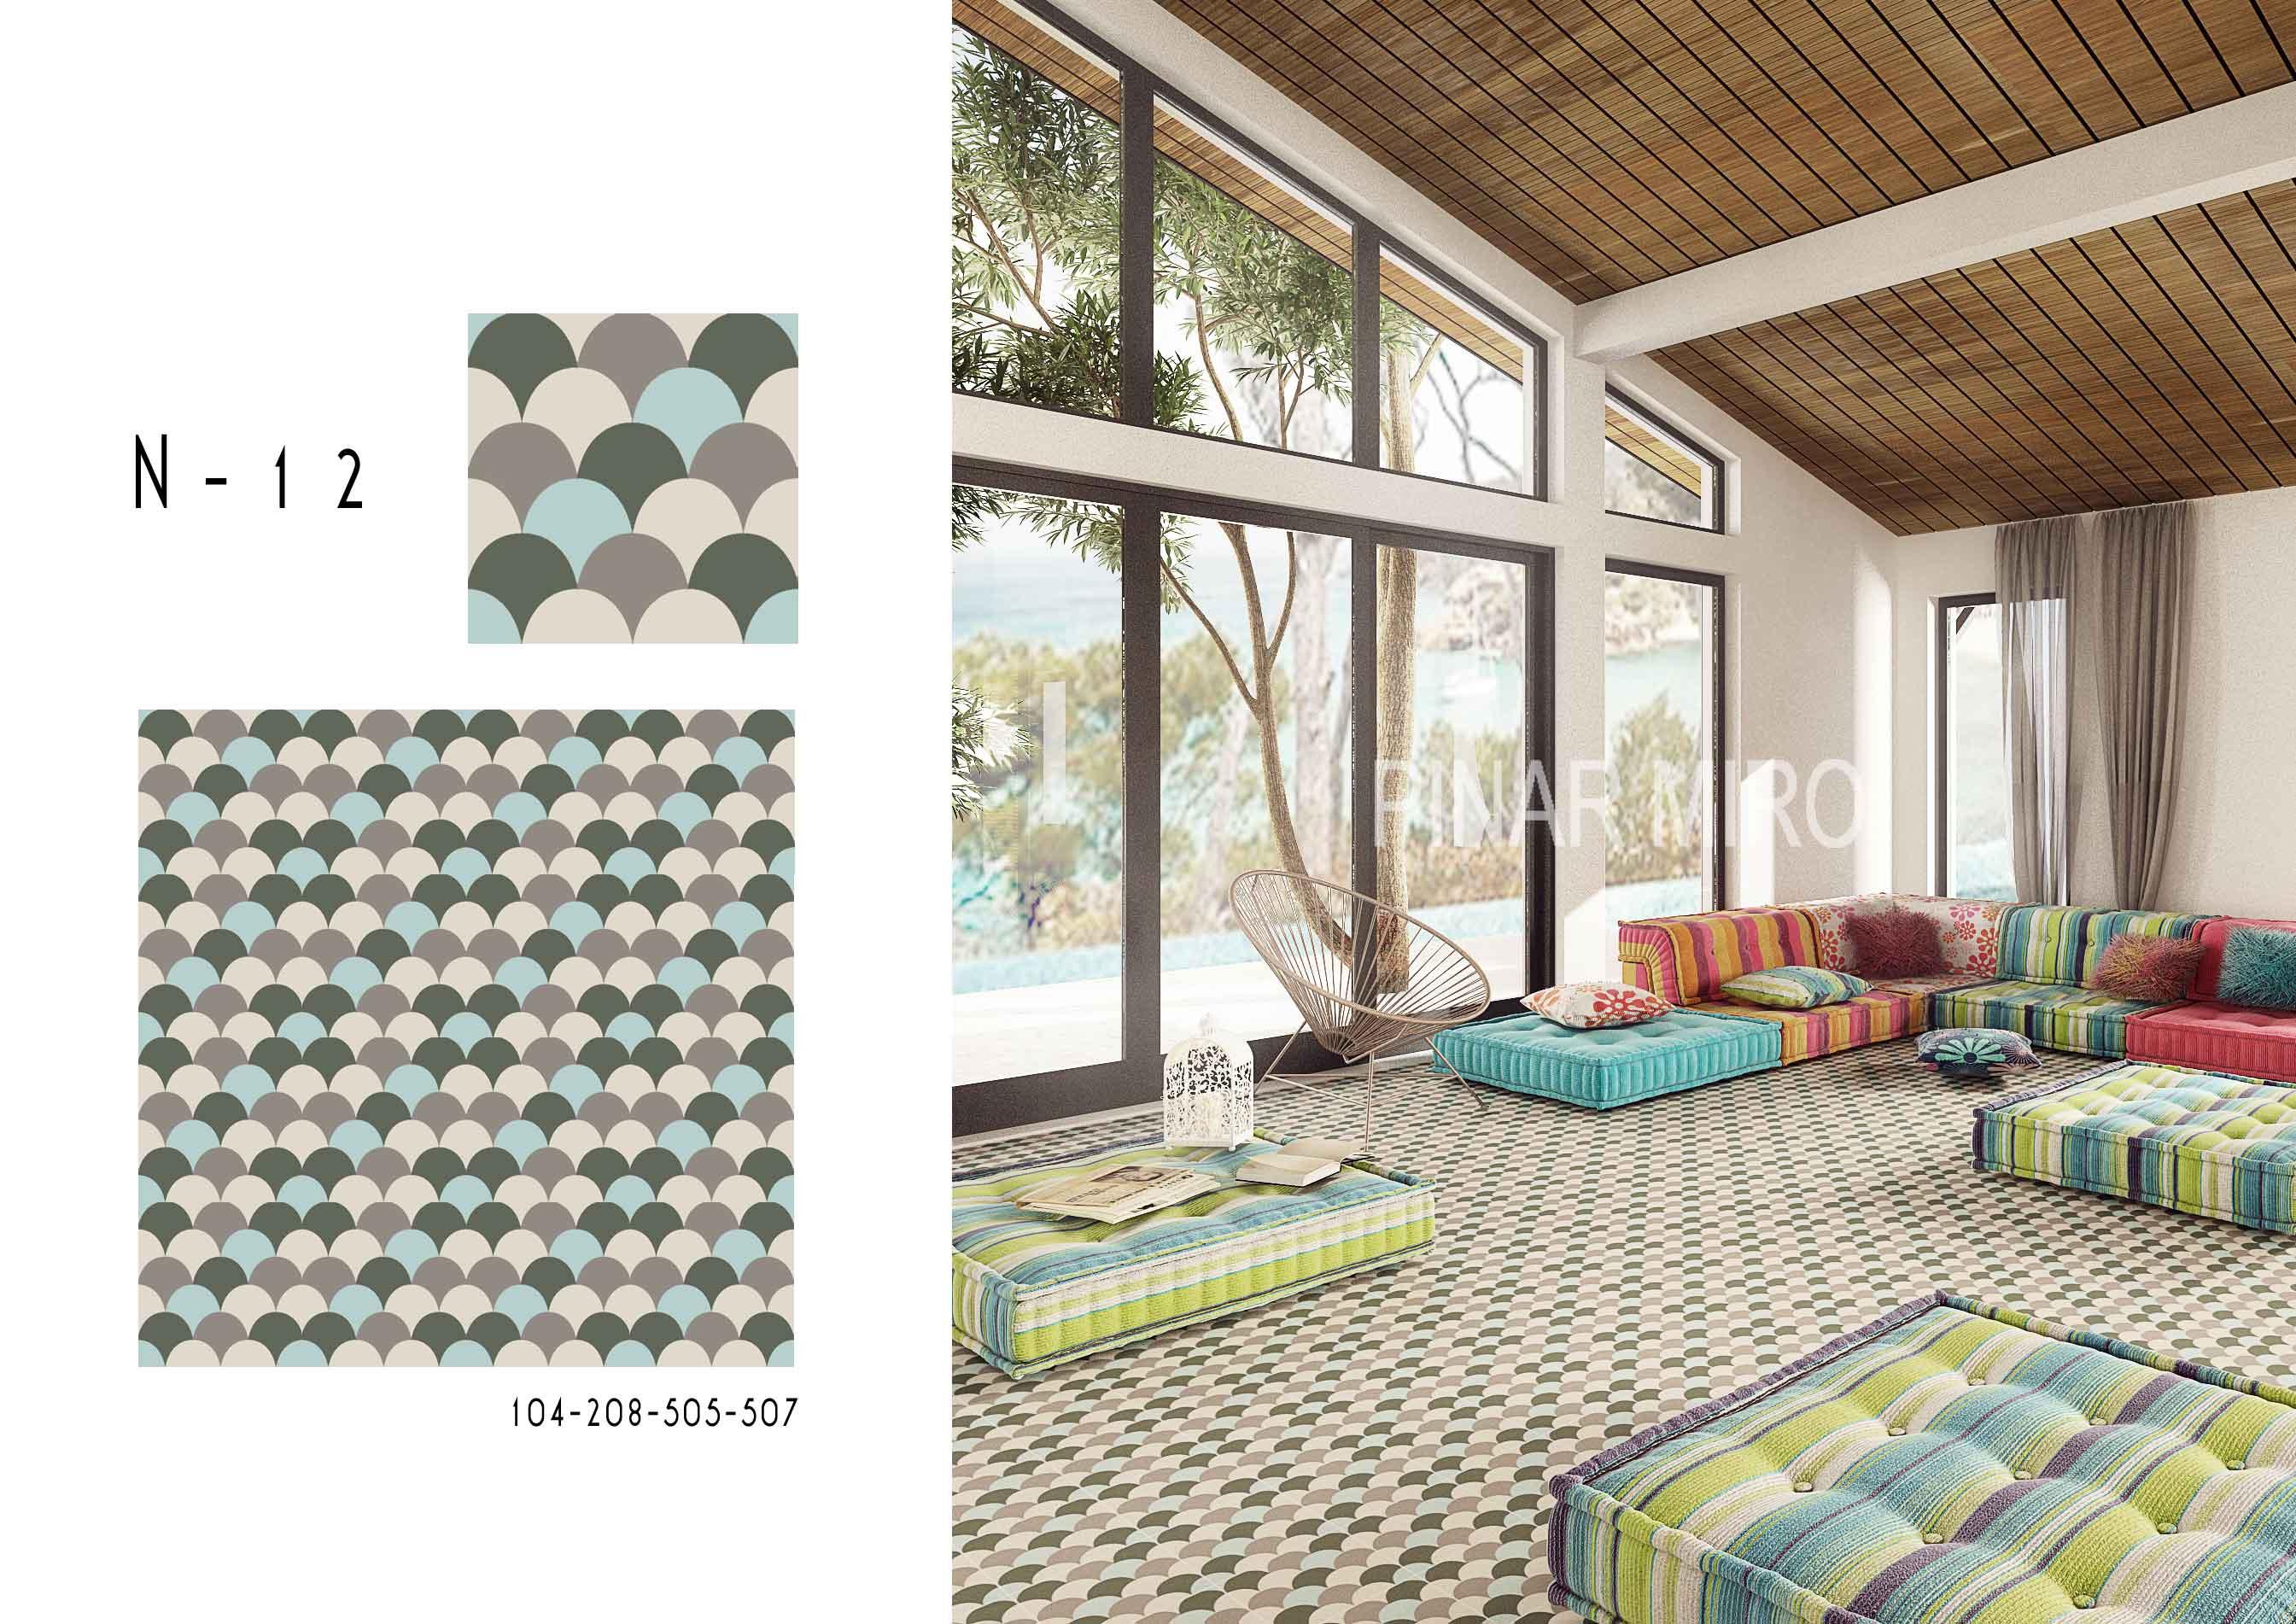 3-n12-pinar-miro-cement-tiles